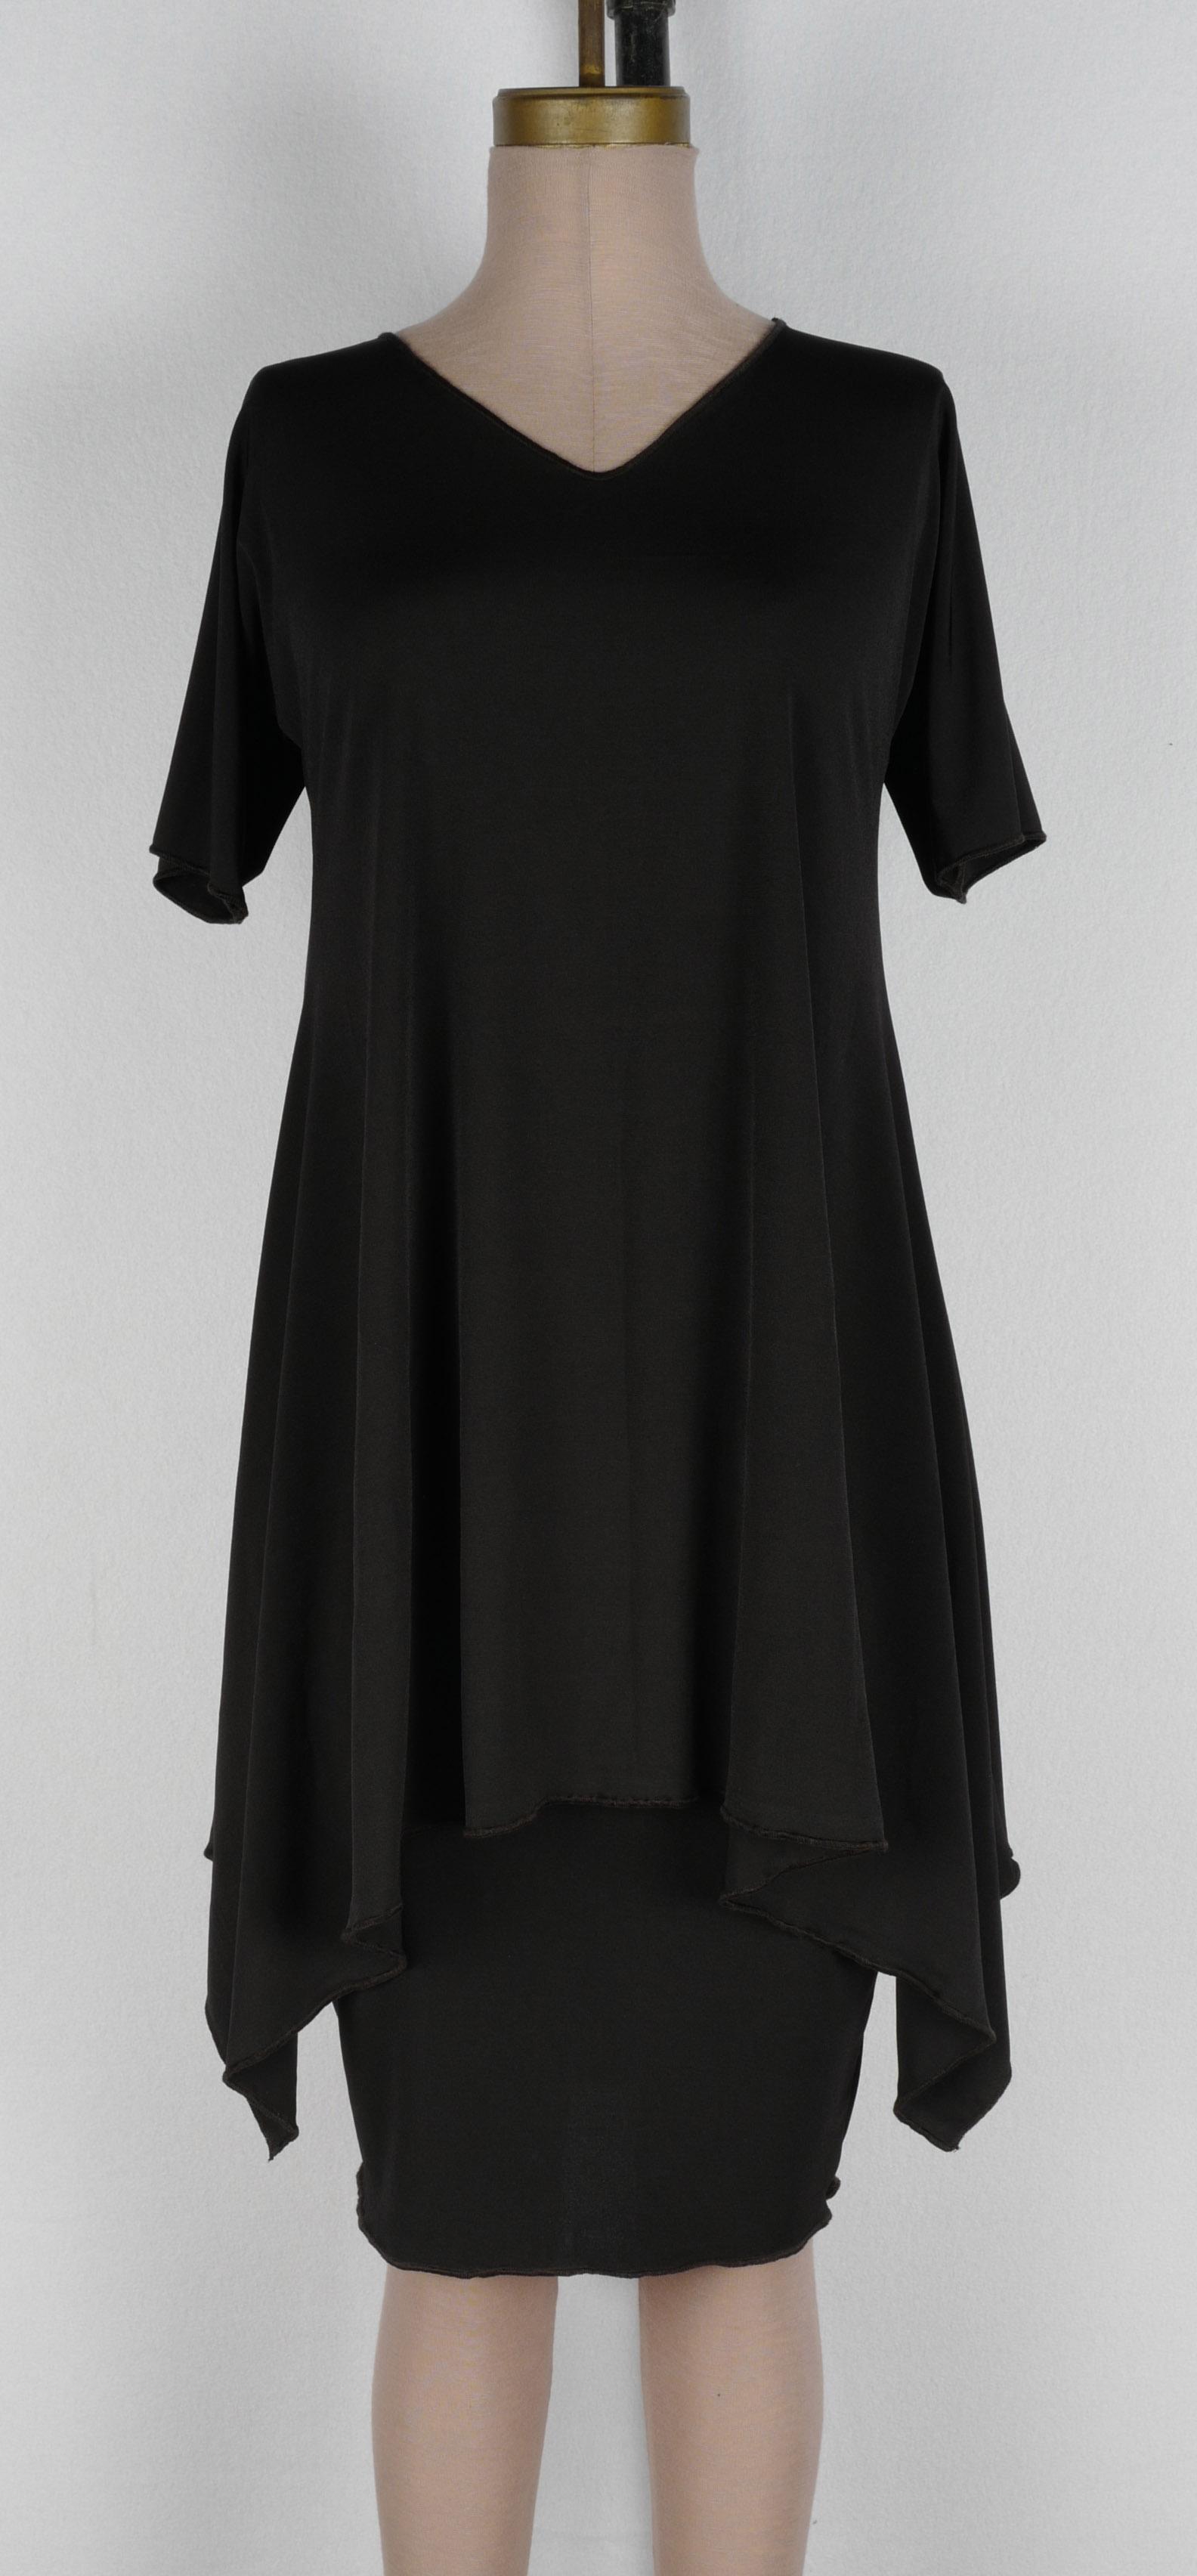 Short Sleeved V Arch Tunic $125 • S M L XL